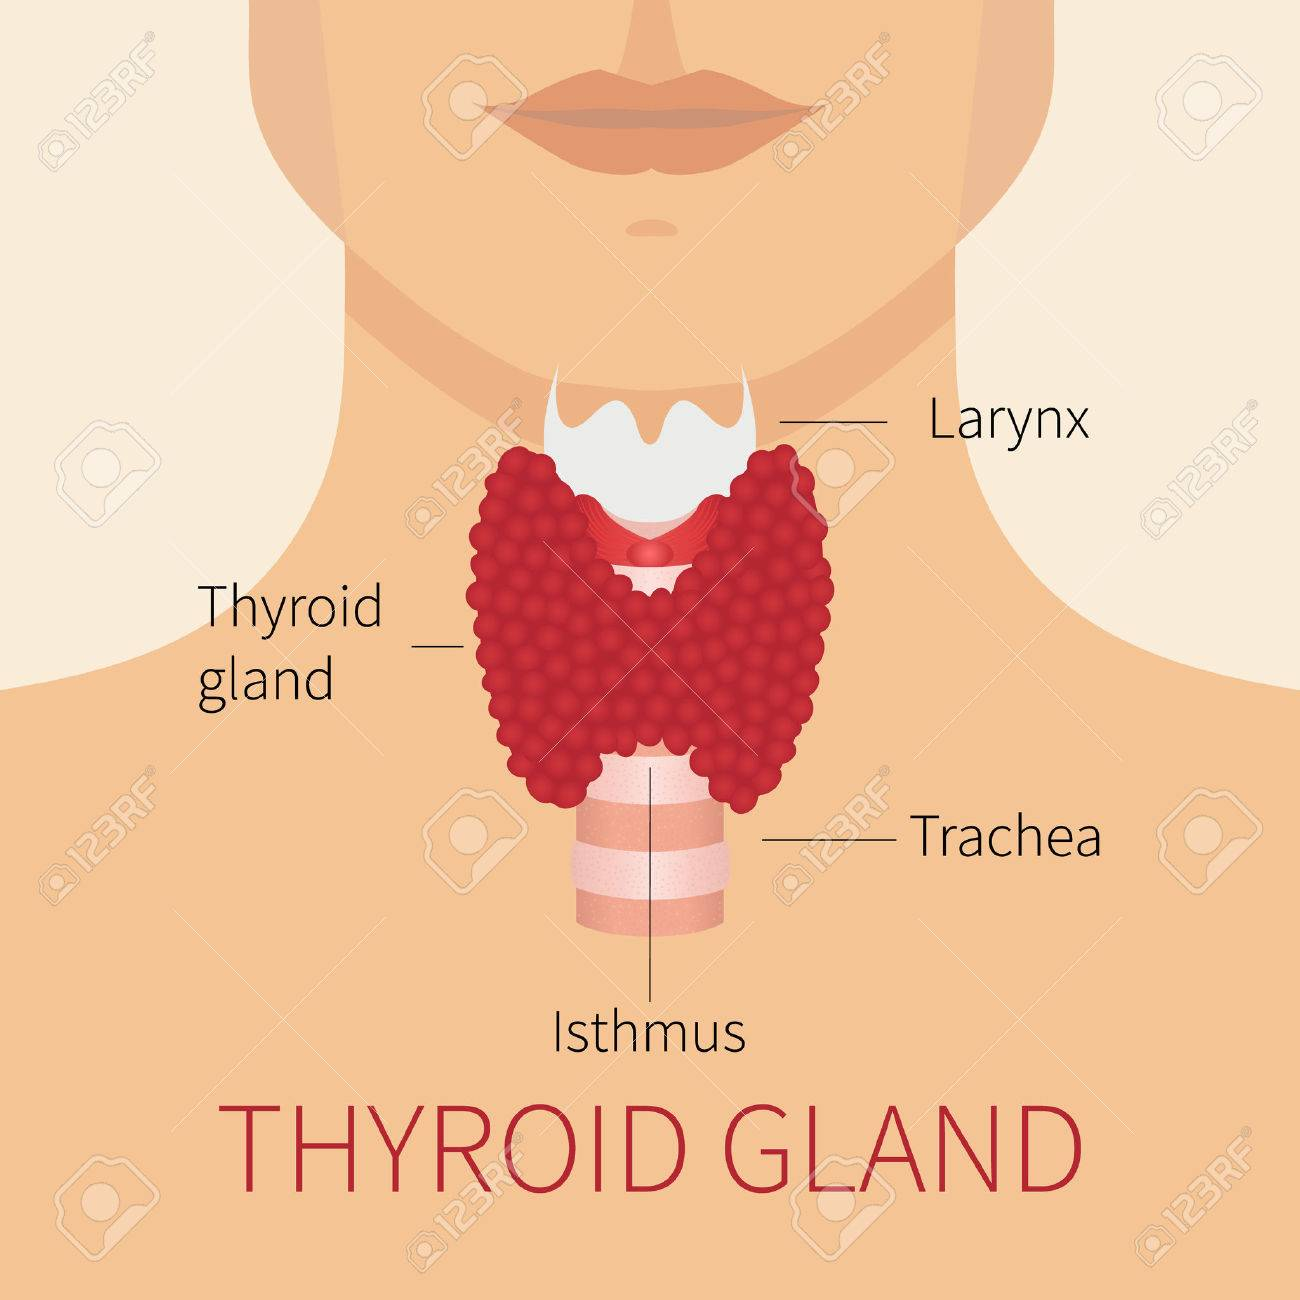 Ilustración Vectorial De La Glándula Tiroides. Glándula Tiroides Y ...